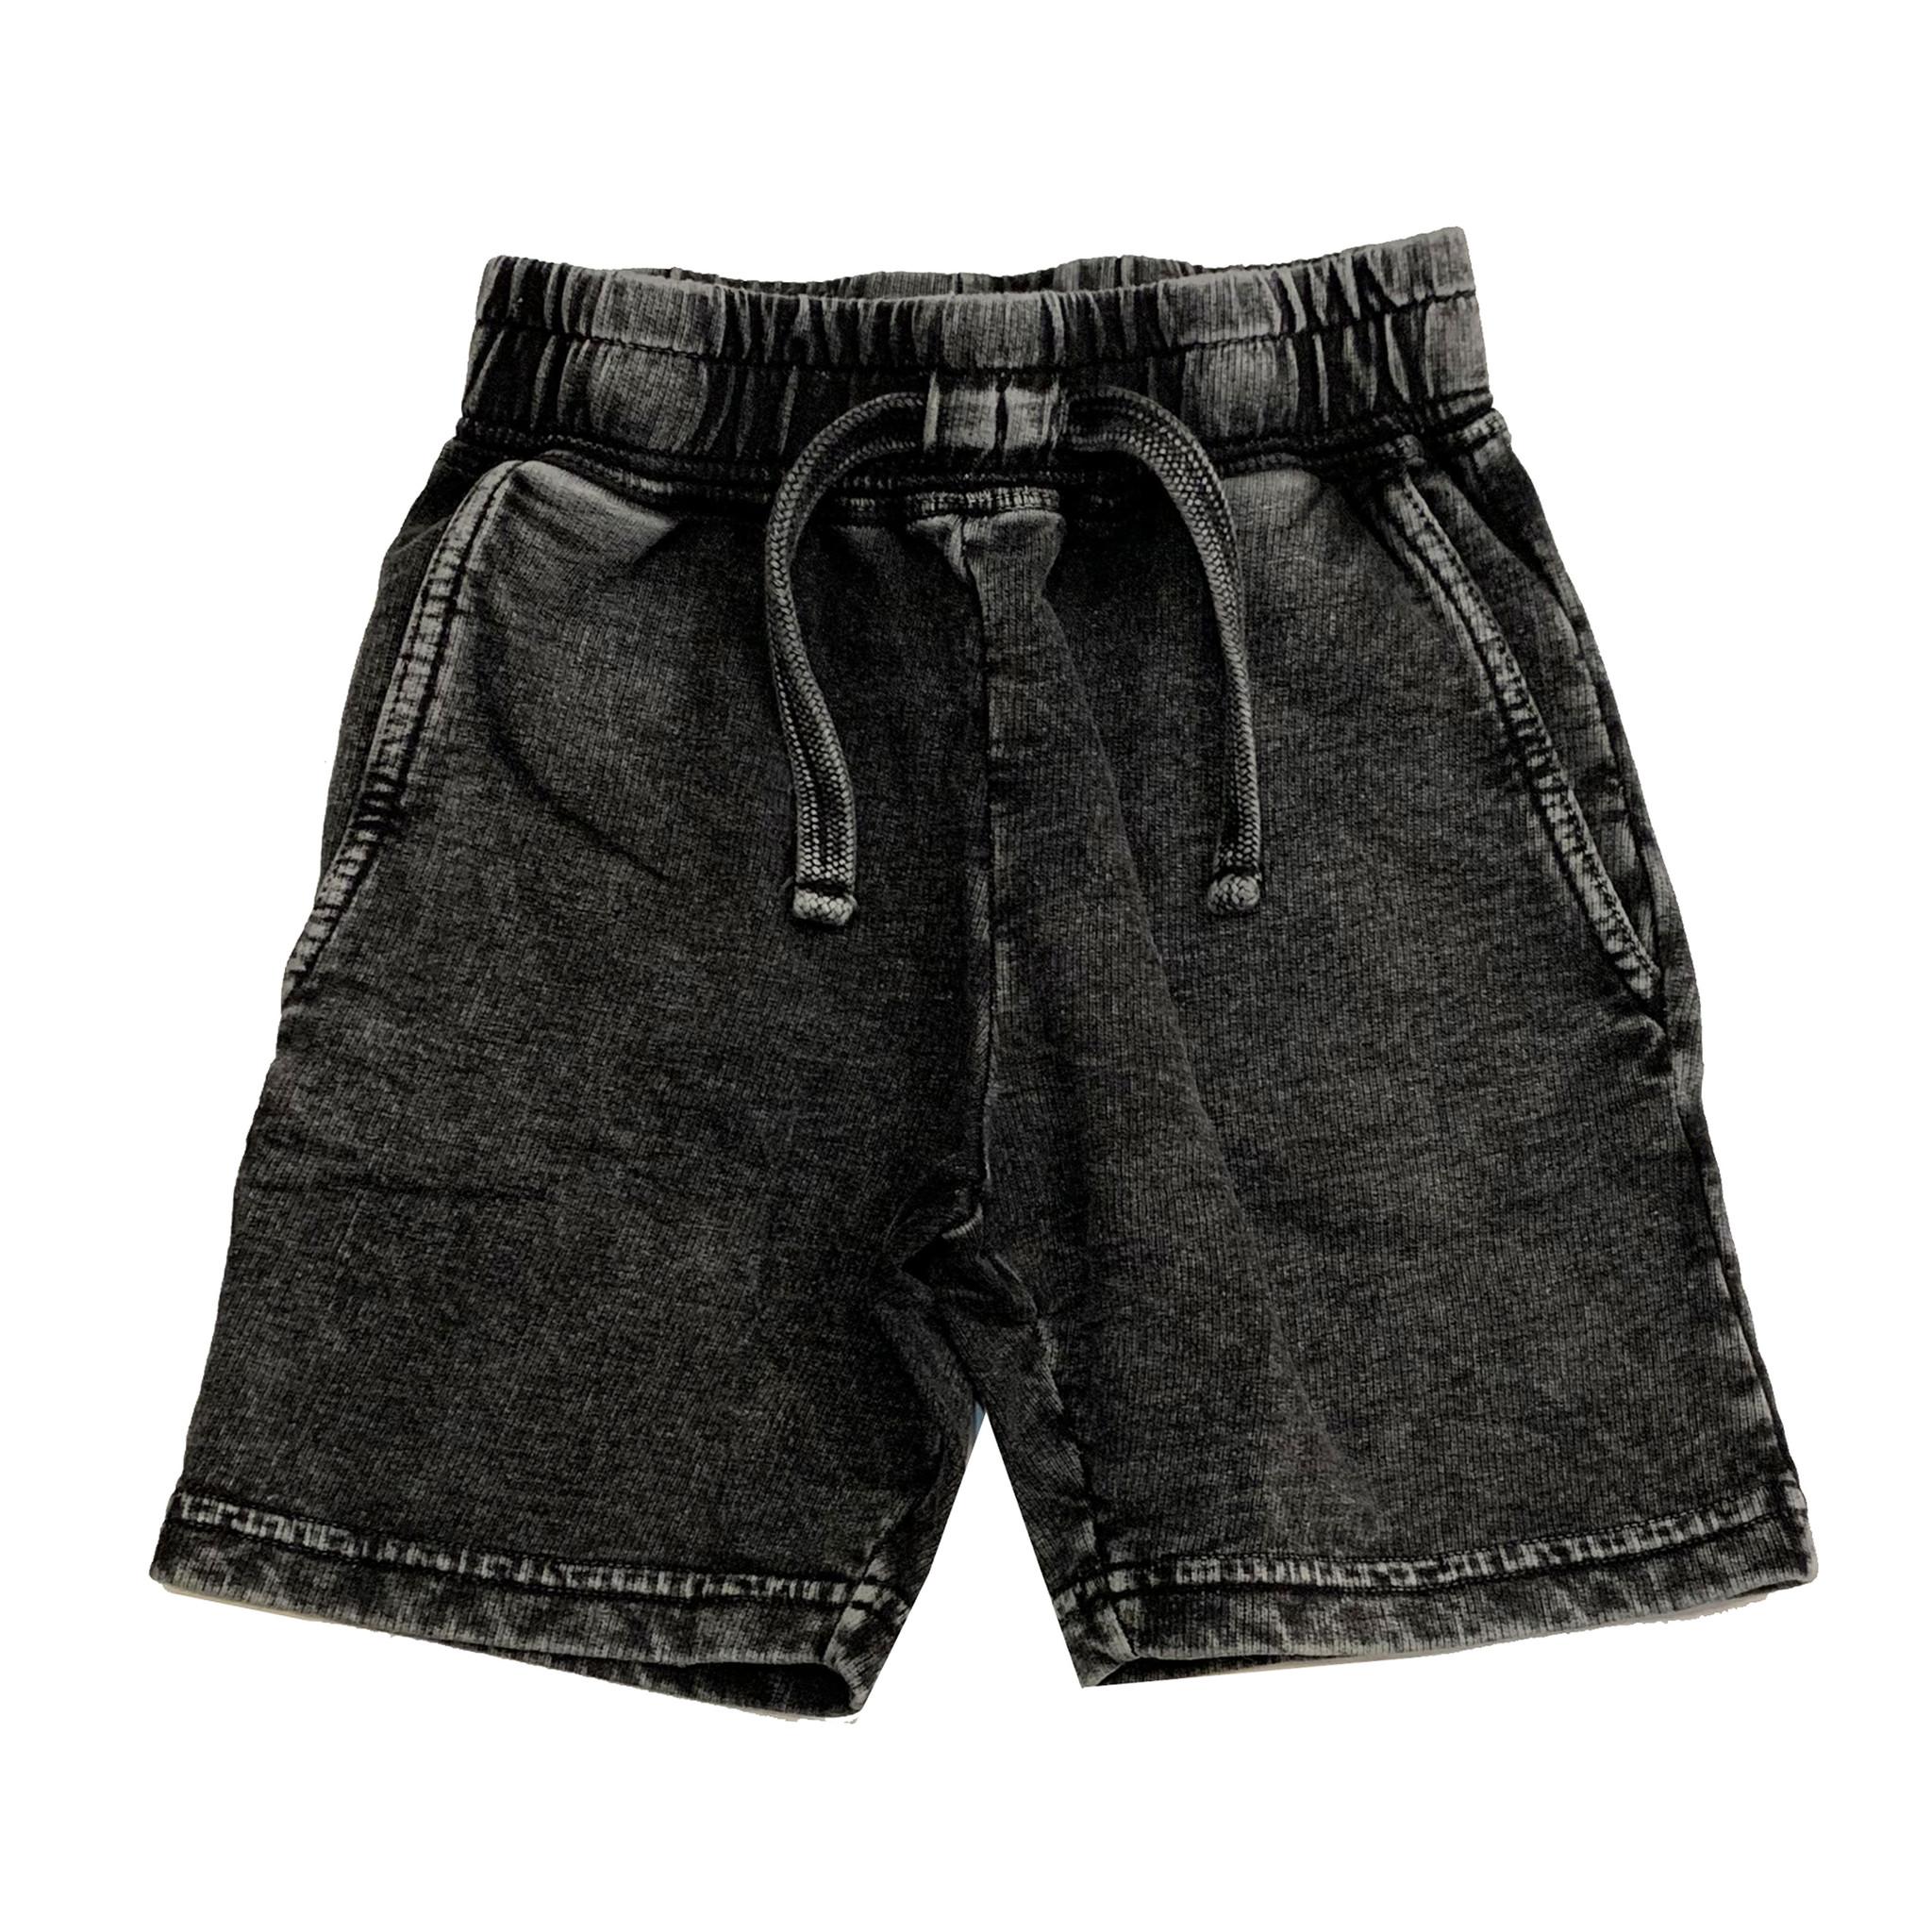 Mish Black Enzyme Infant Shorts